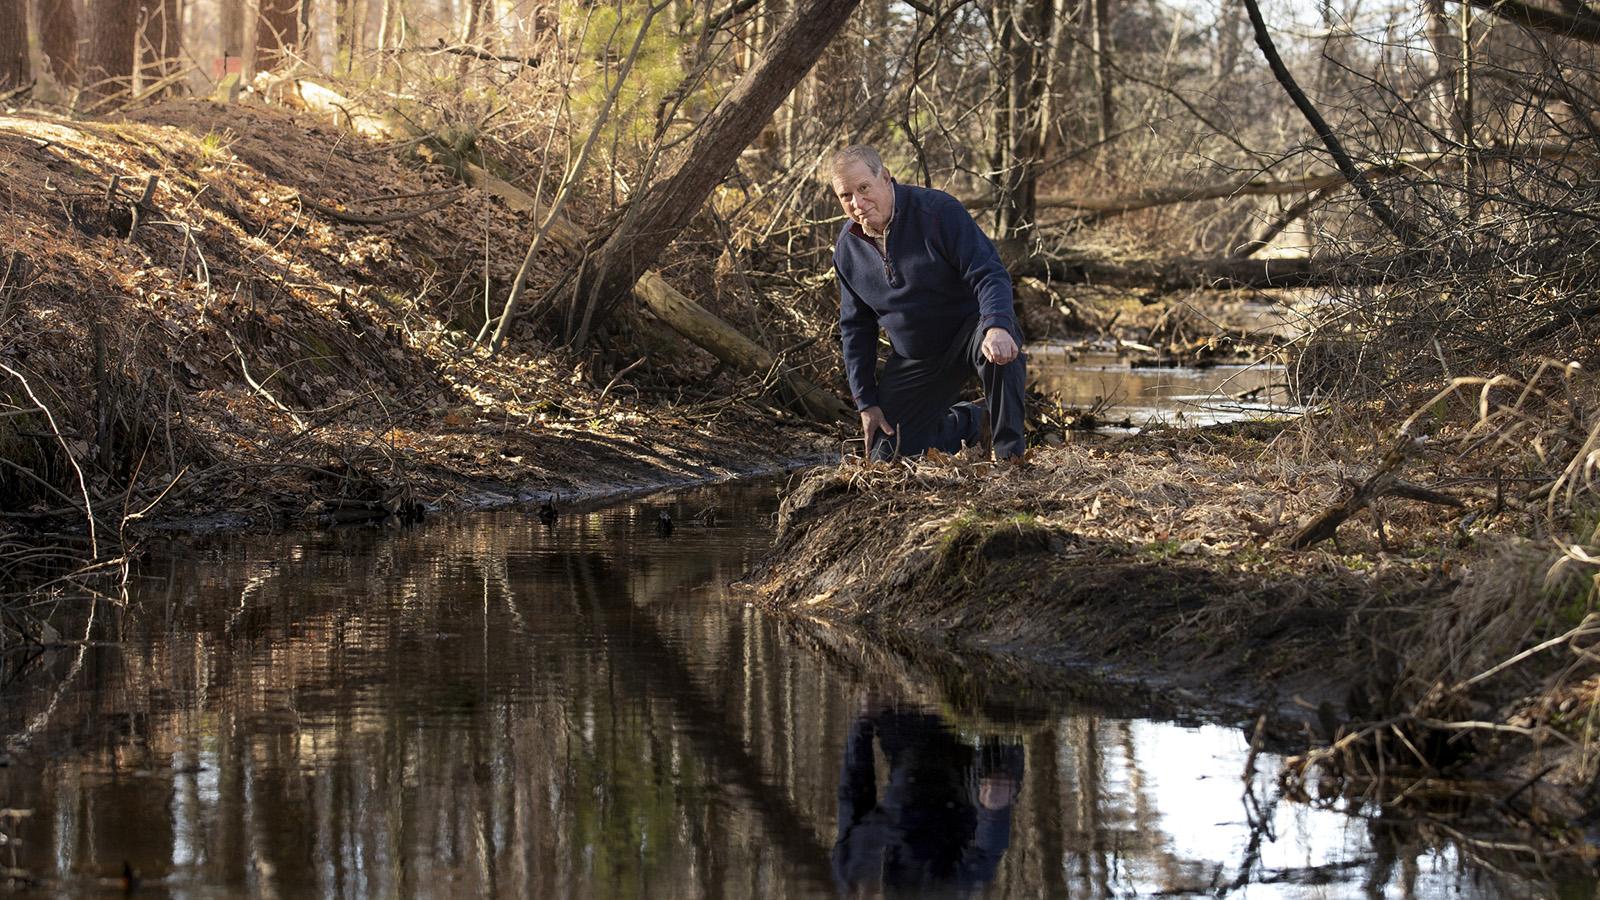 Man kneeling at edge of creek in wooded area